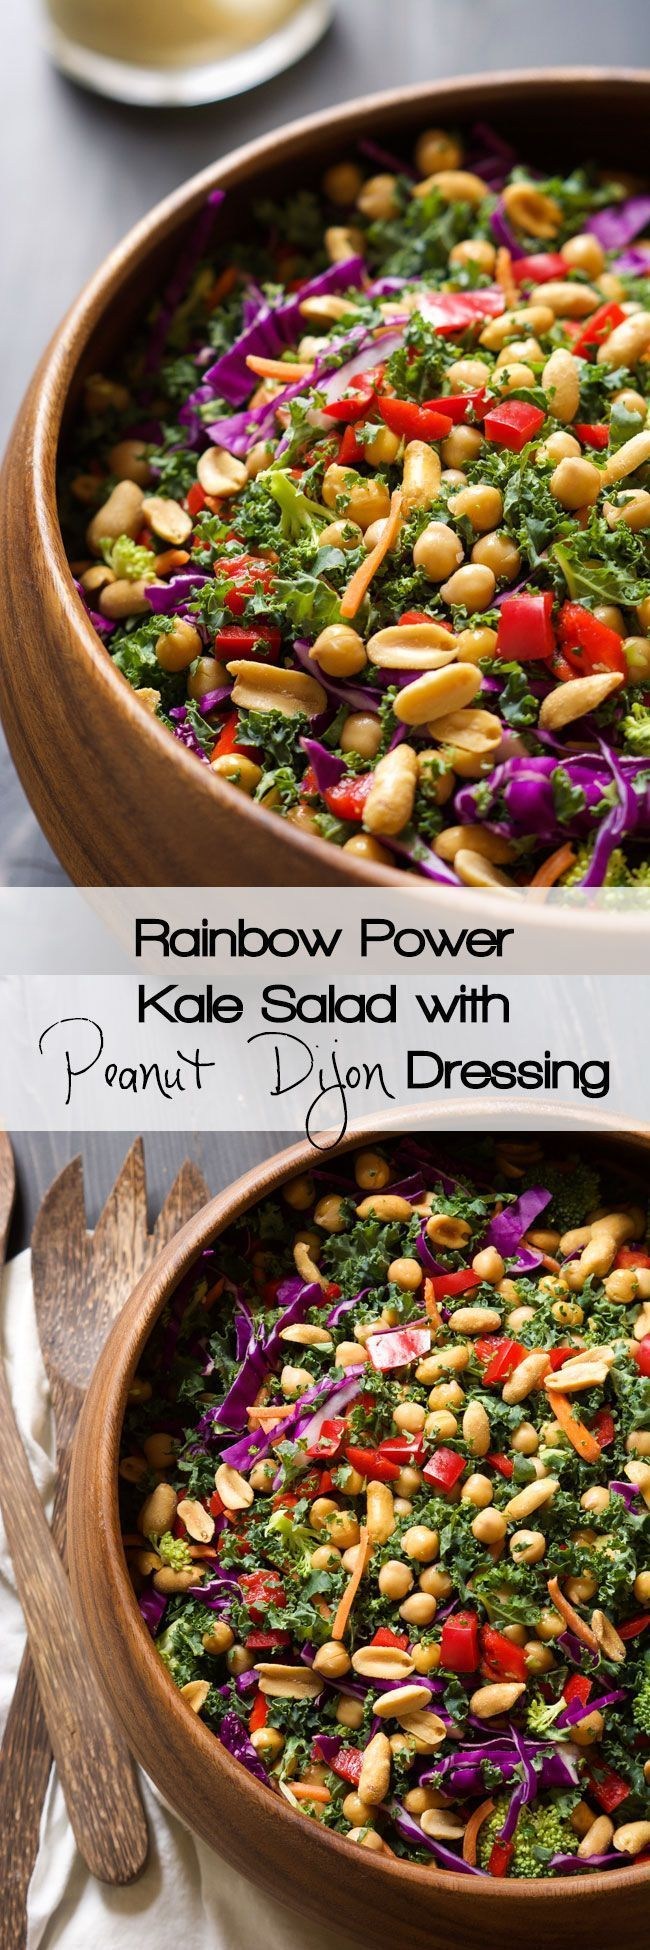 Power Kale Salad, Healthy, Gluten Free, Vegan, Recipes, Easy, Simple, Best, Chickpeas, Chopped, Raw